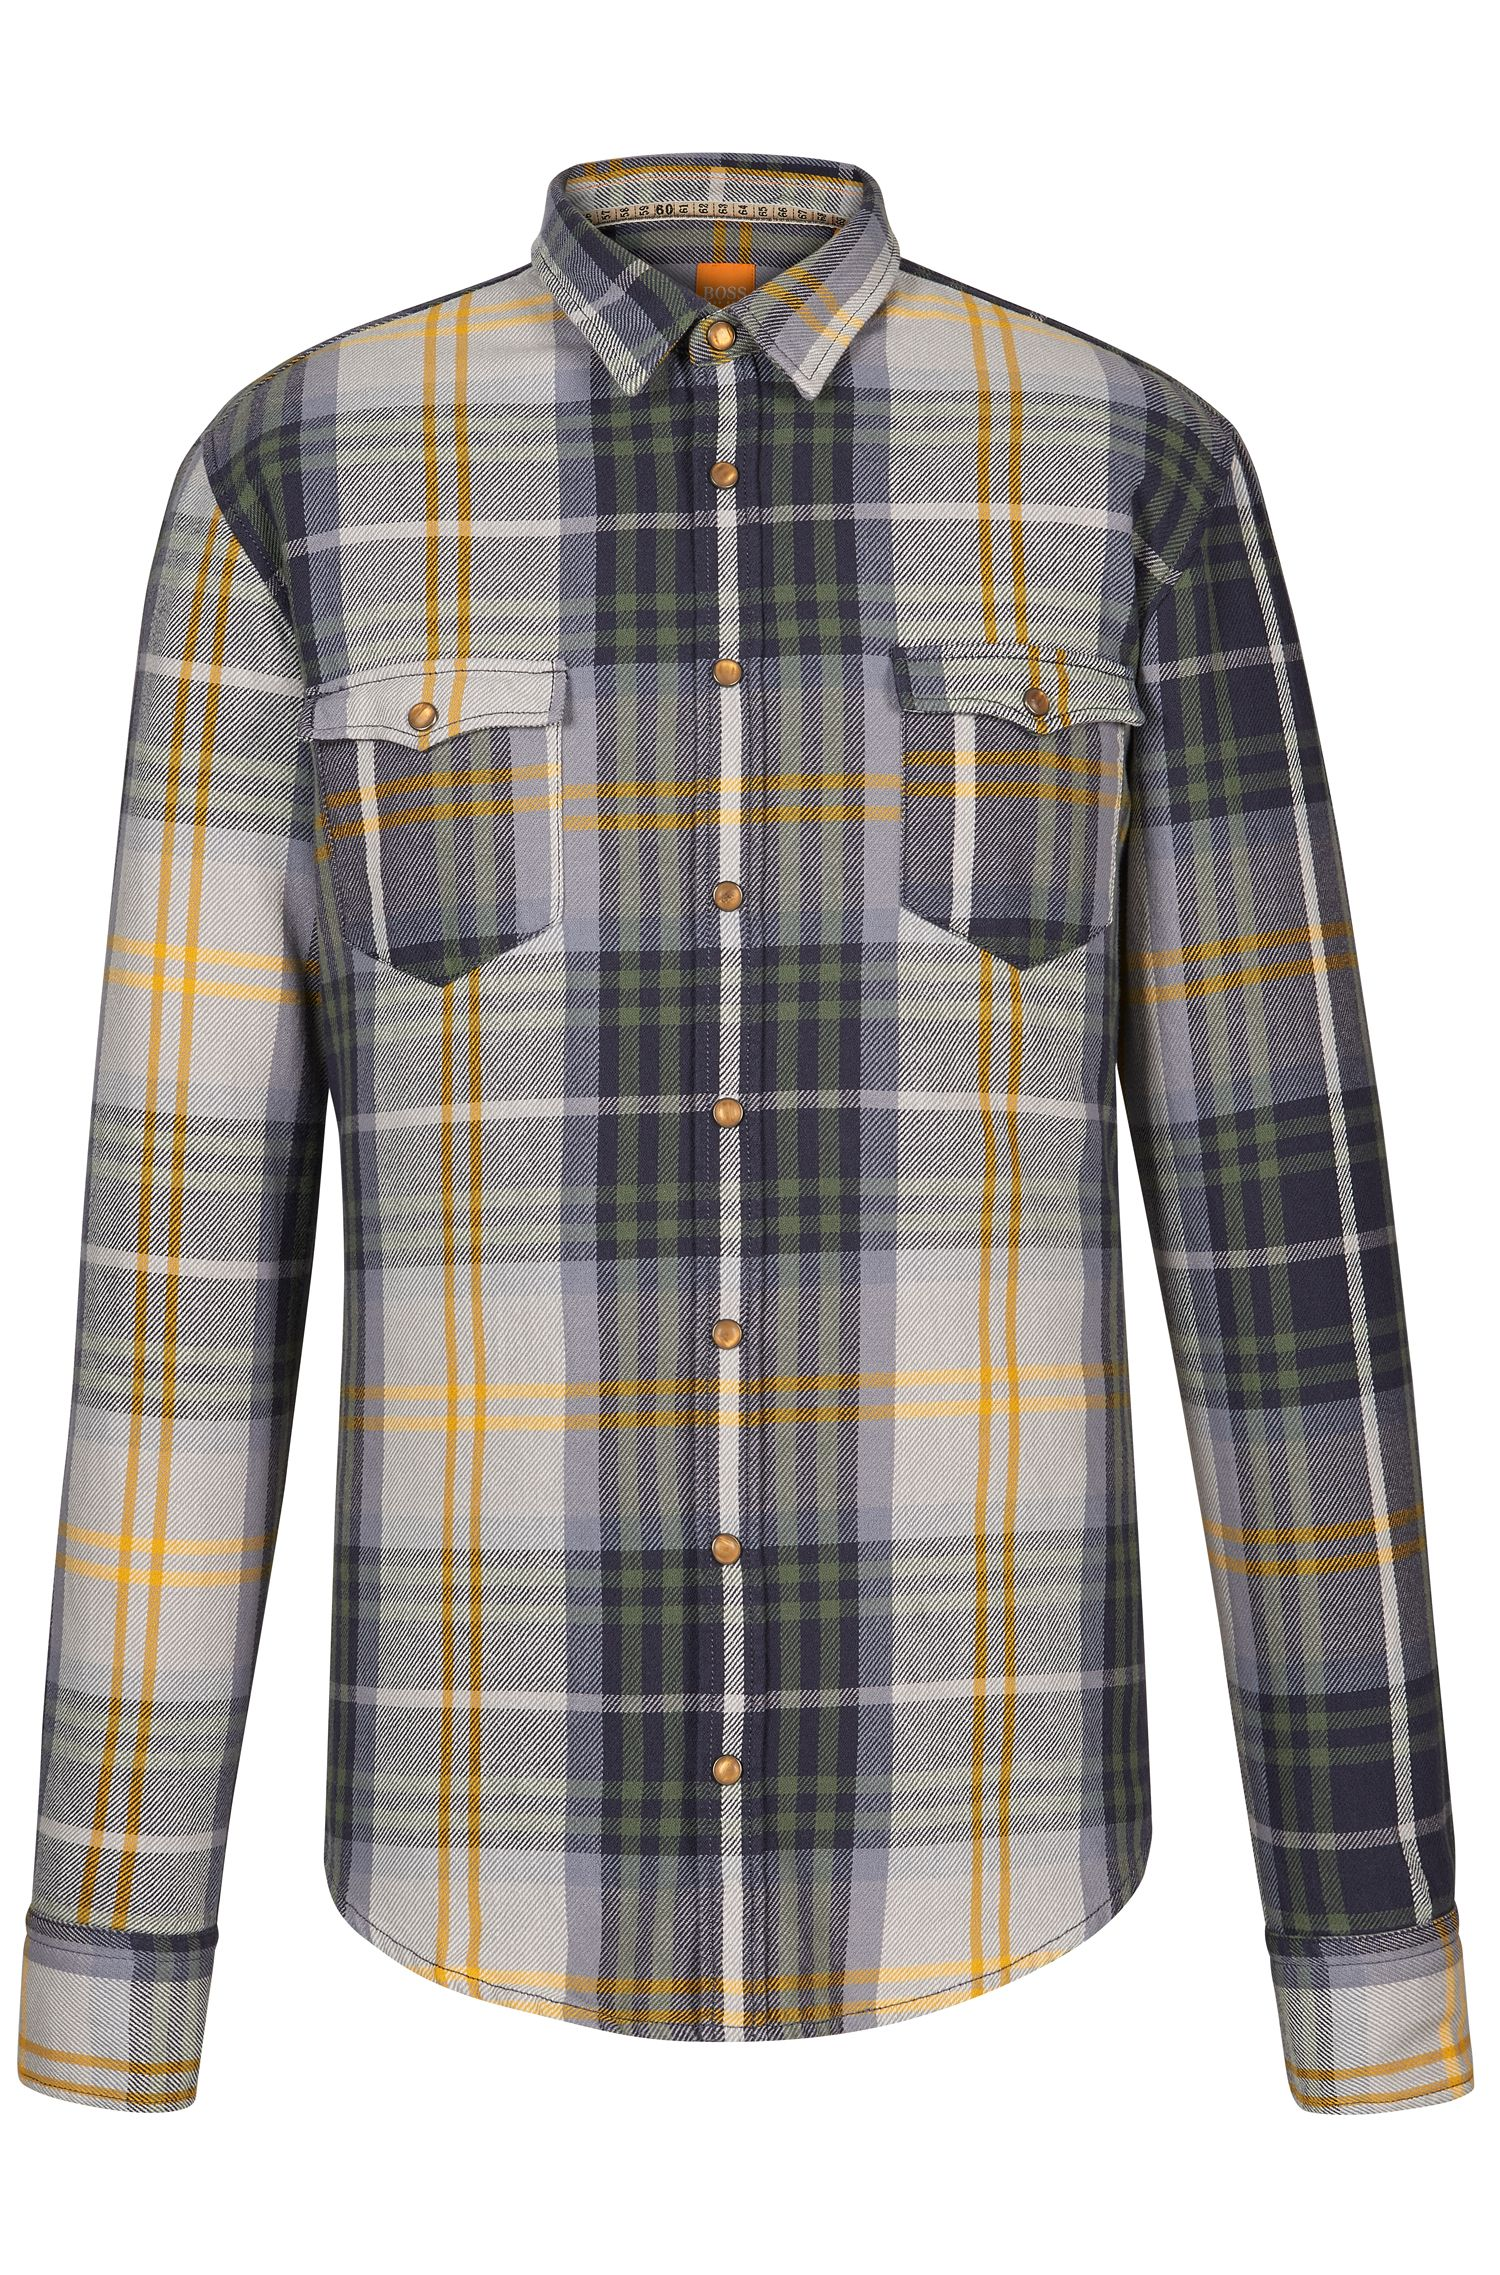 Plaid Cotton Button Down Shirt, Slim Fit   EdoslimE